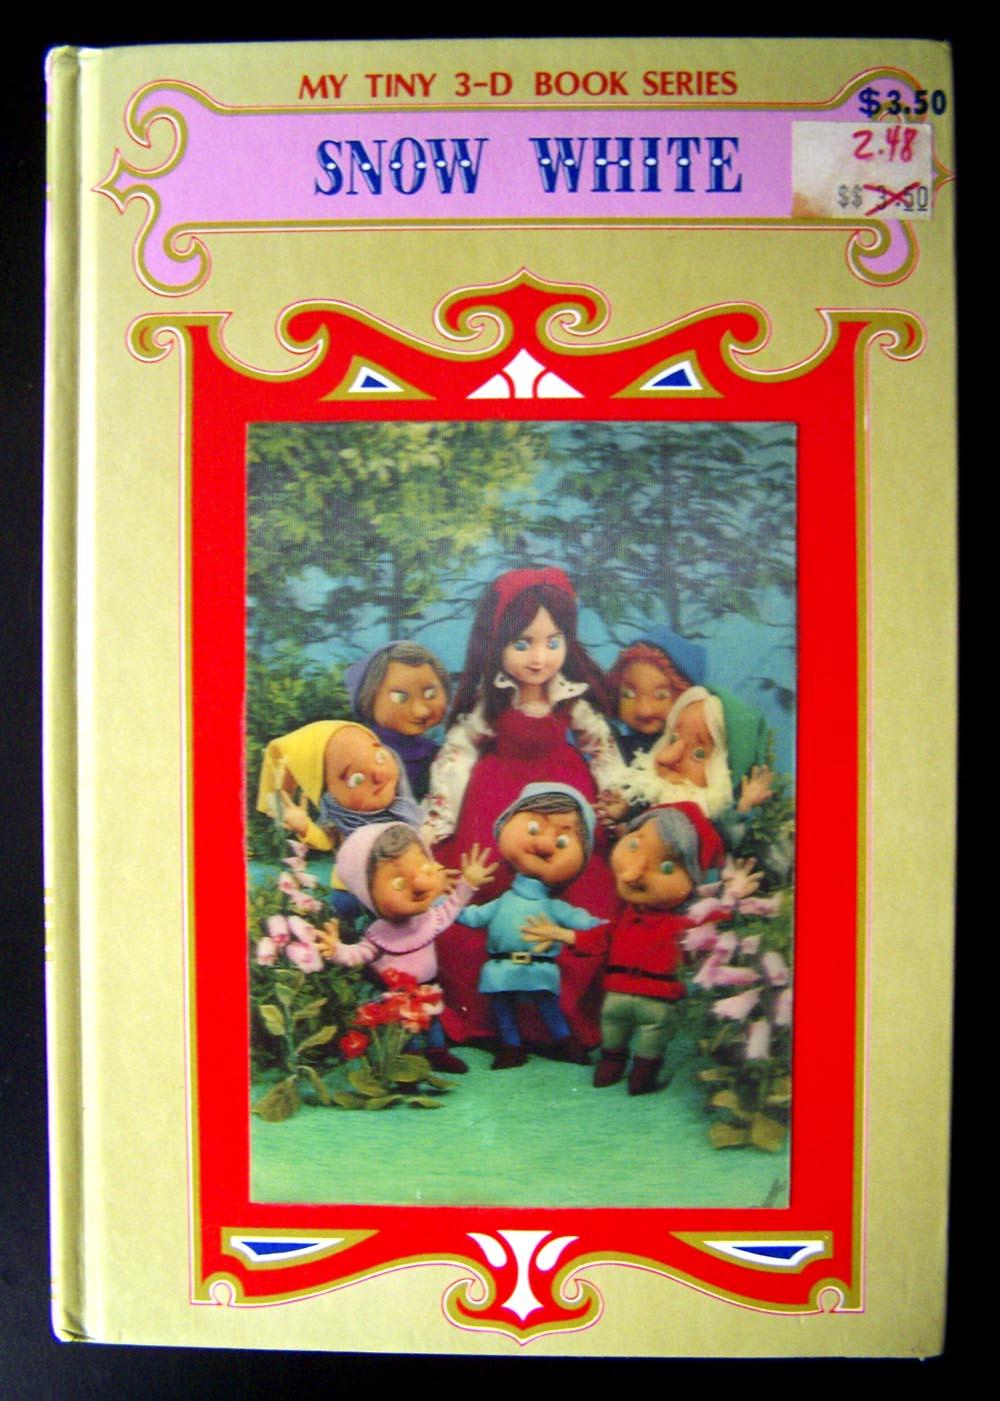 Book Cover Of Snow White ~ Moonkitten s timeline